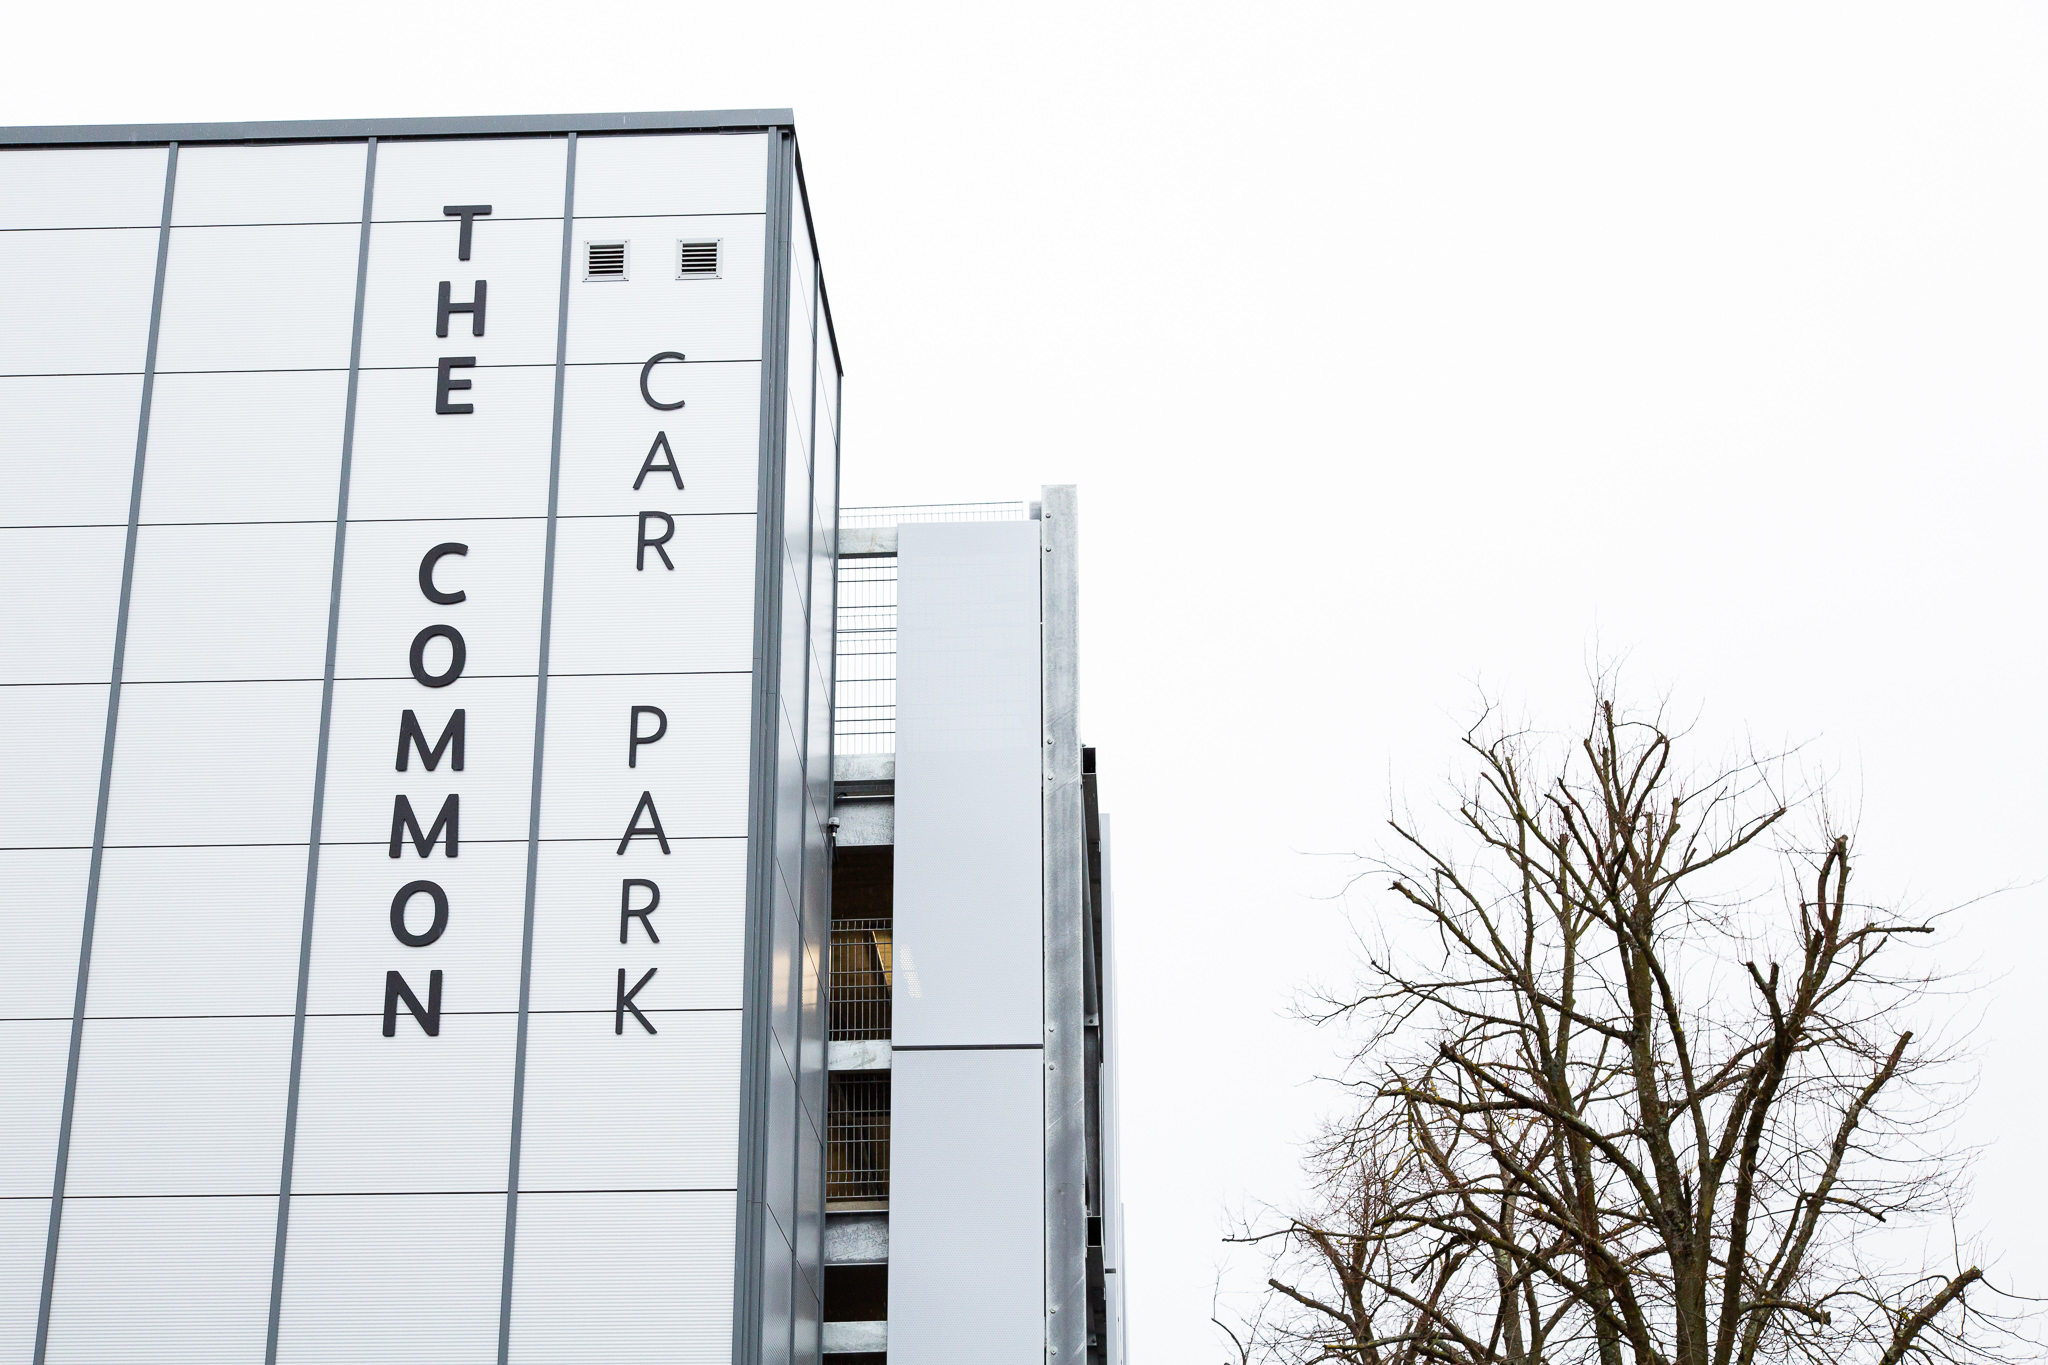 New multi-storey car park unlocks further regeneration opportunities in Hatfield